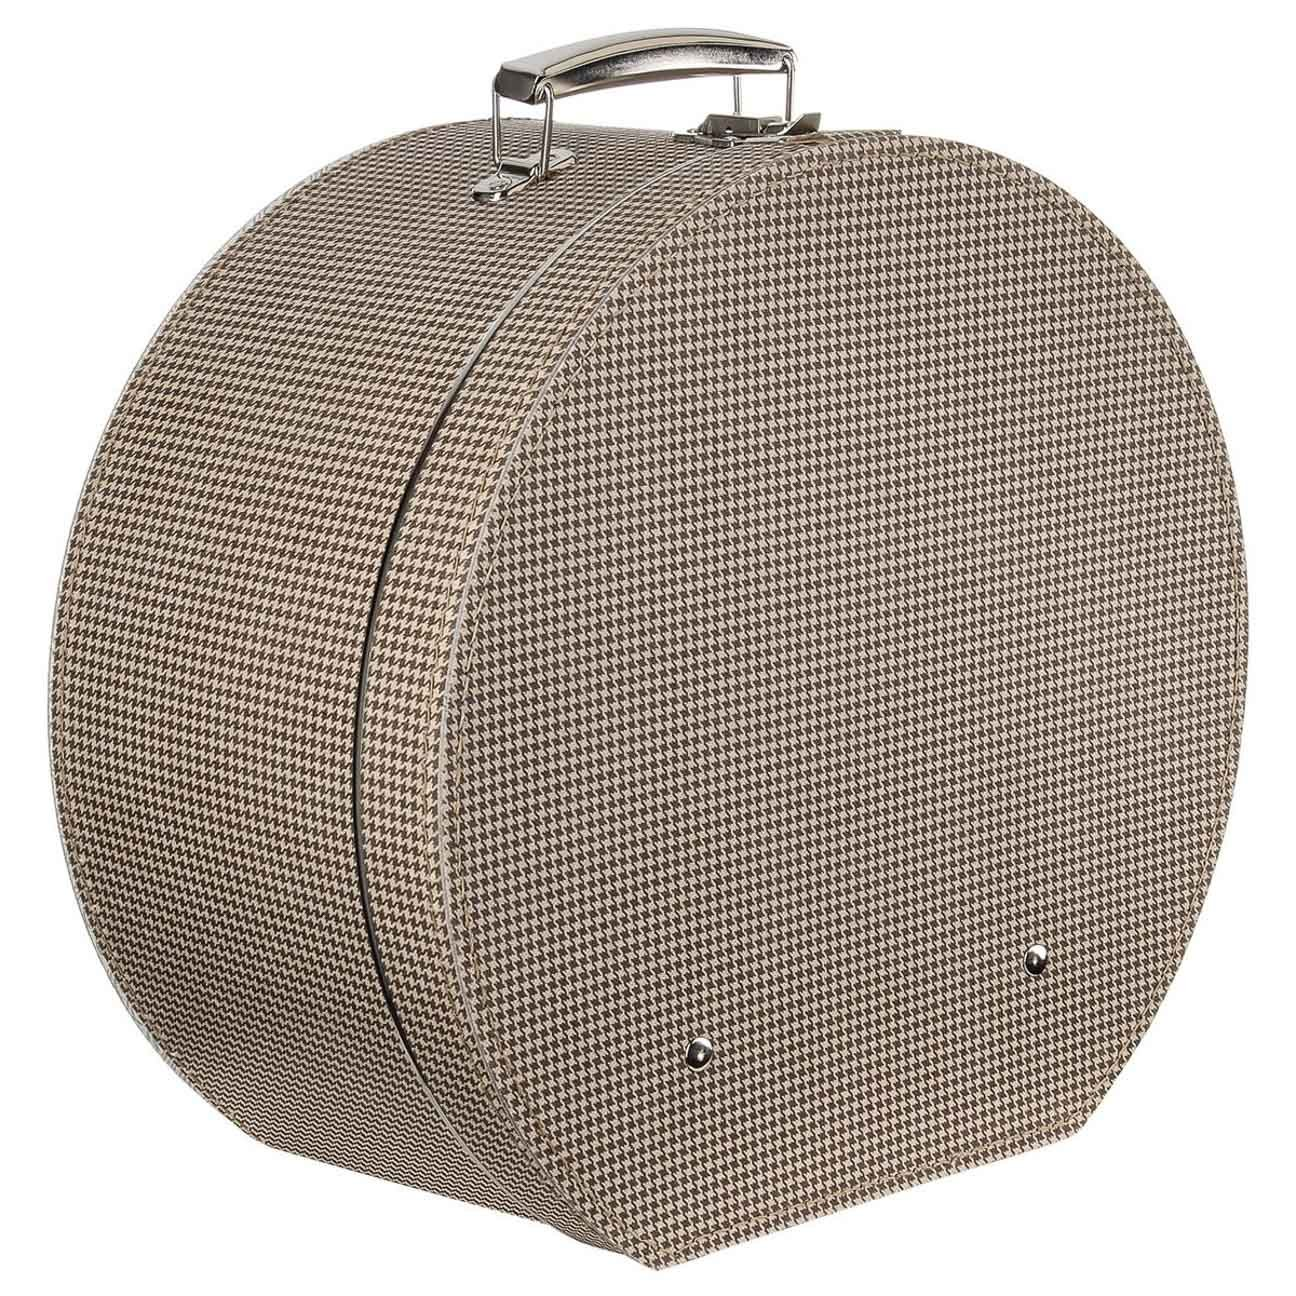 Lierys Caja para Sombrero Pata de Gallo Mujer/Hombre - Made in The EU sombrerera Verano/Invierno